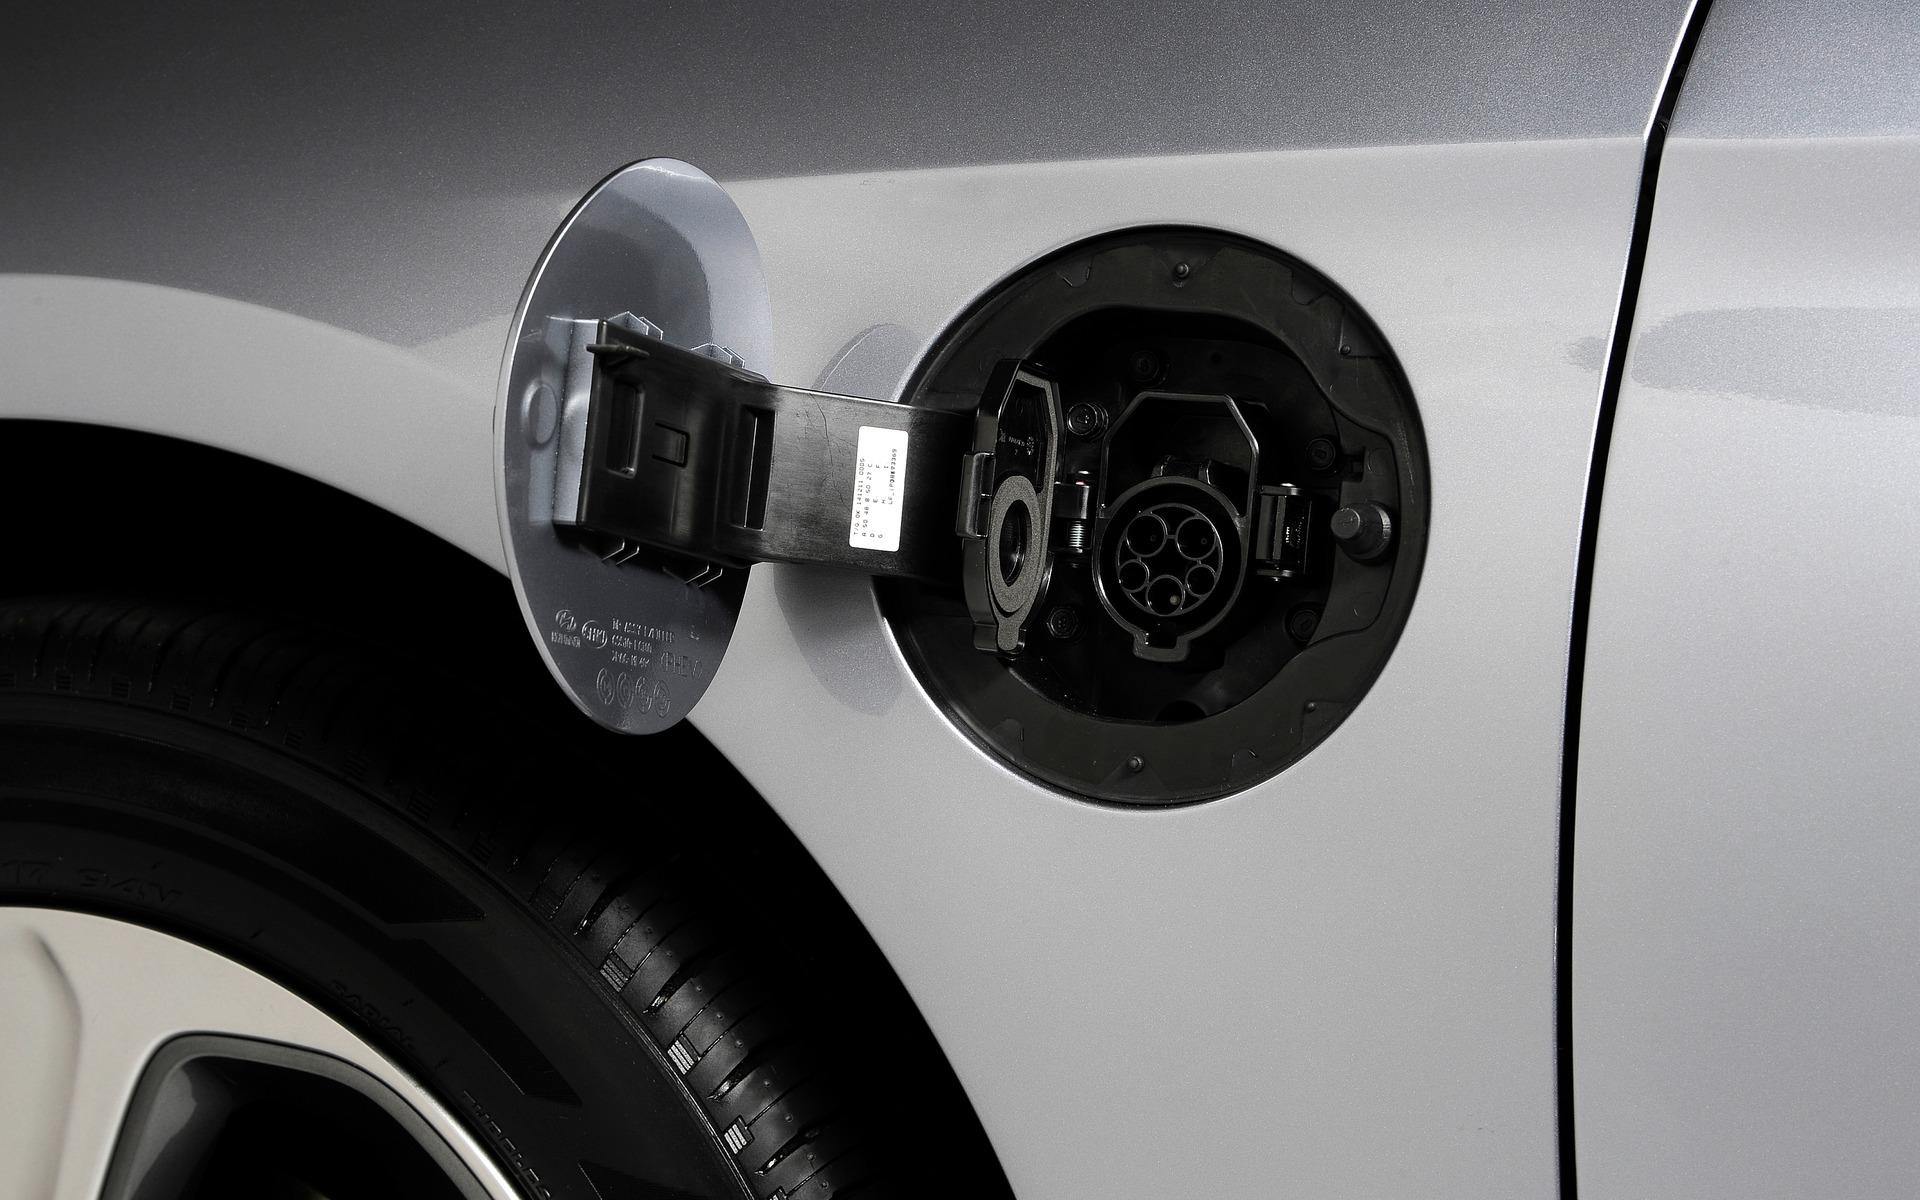 Hyundai Sonata Hybride branchable 2016 - Port de recharge